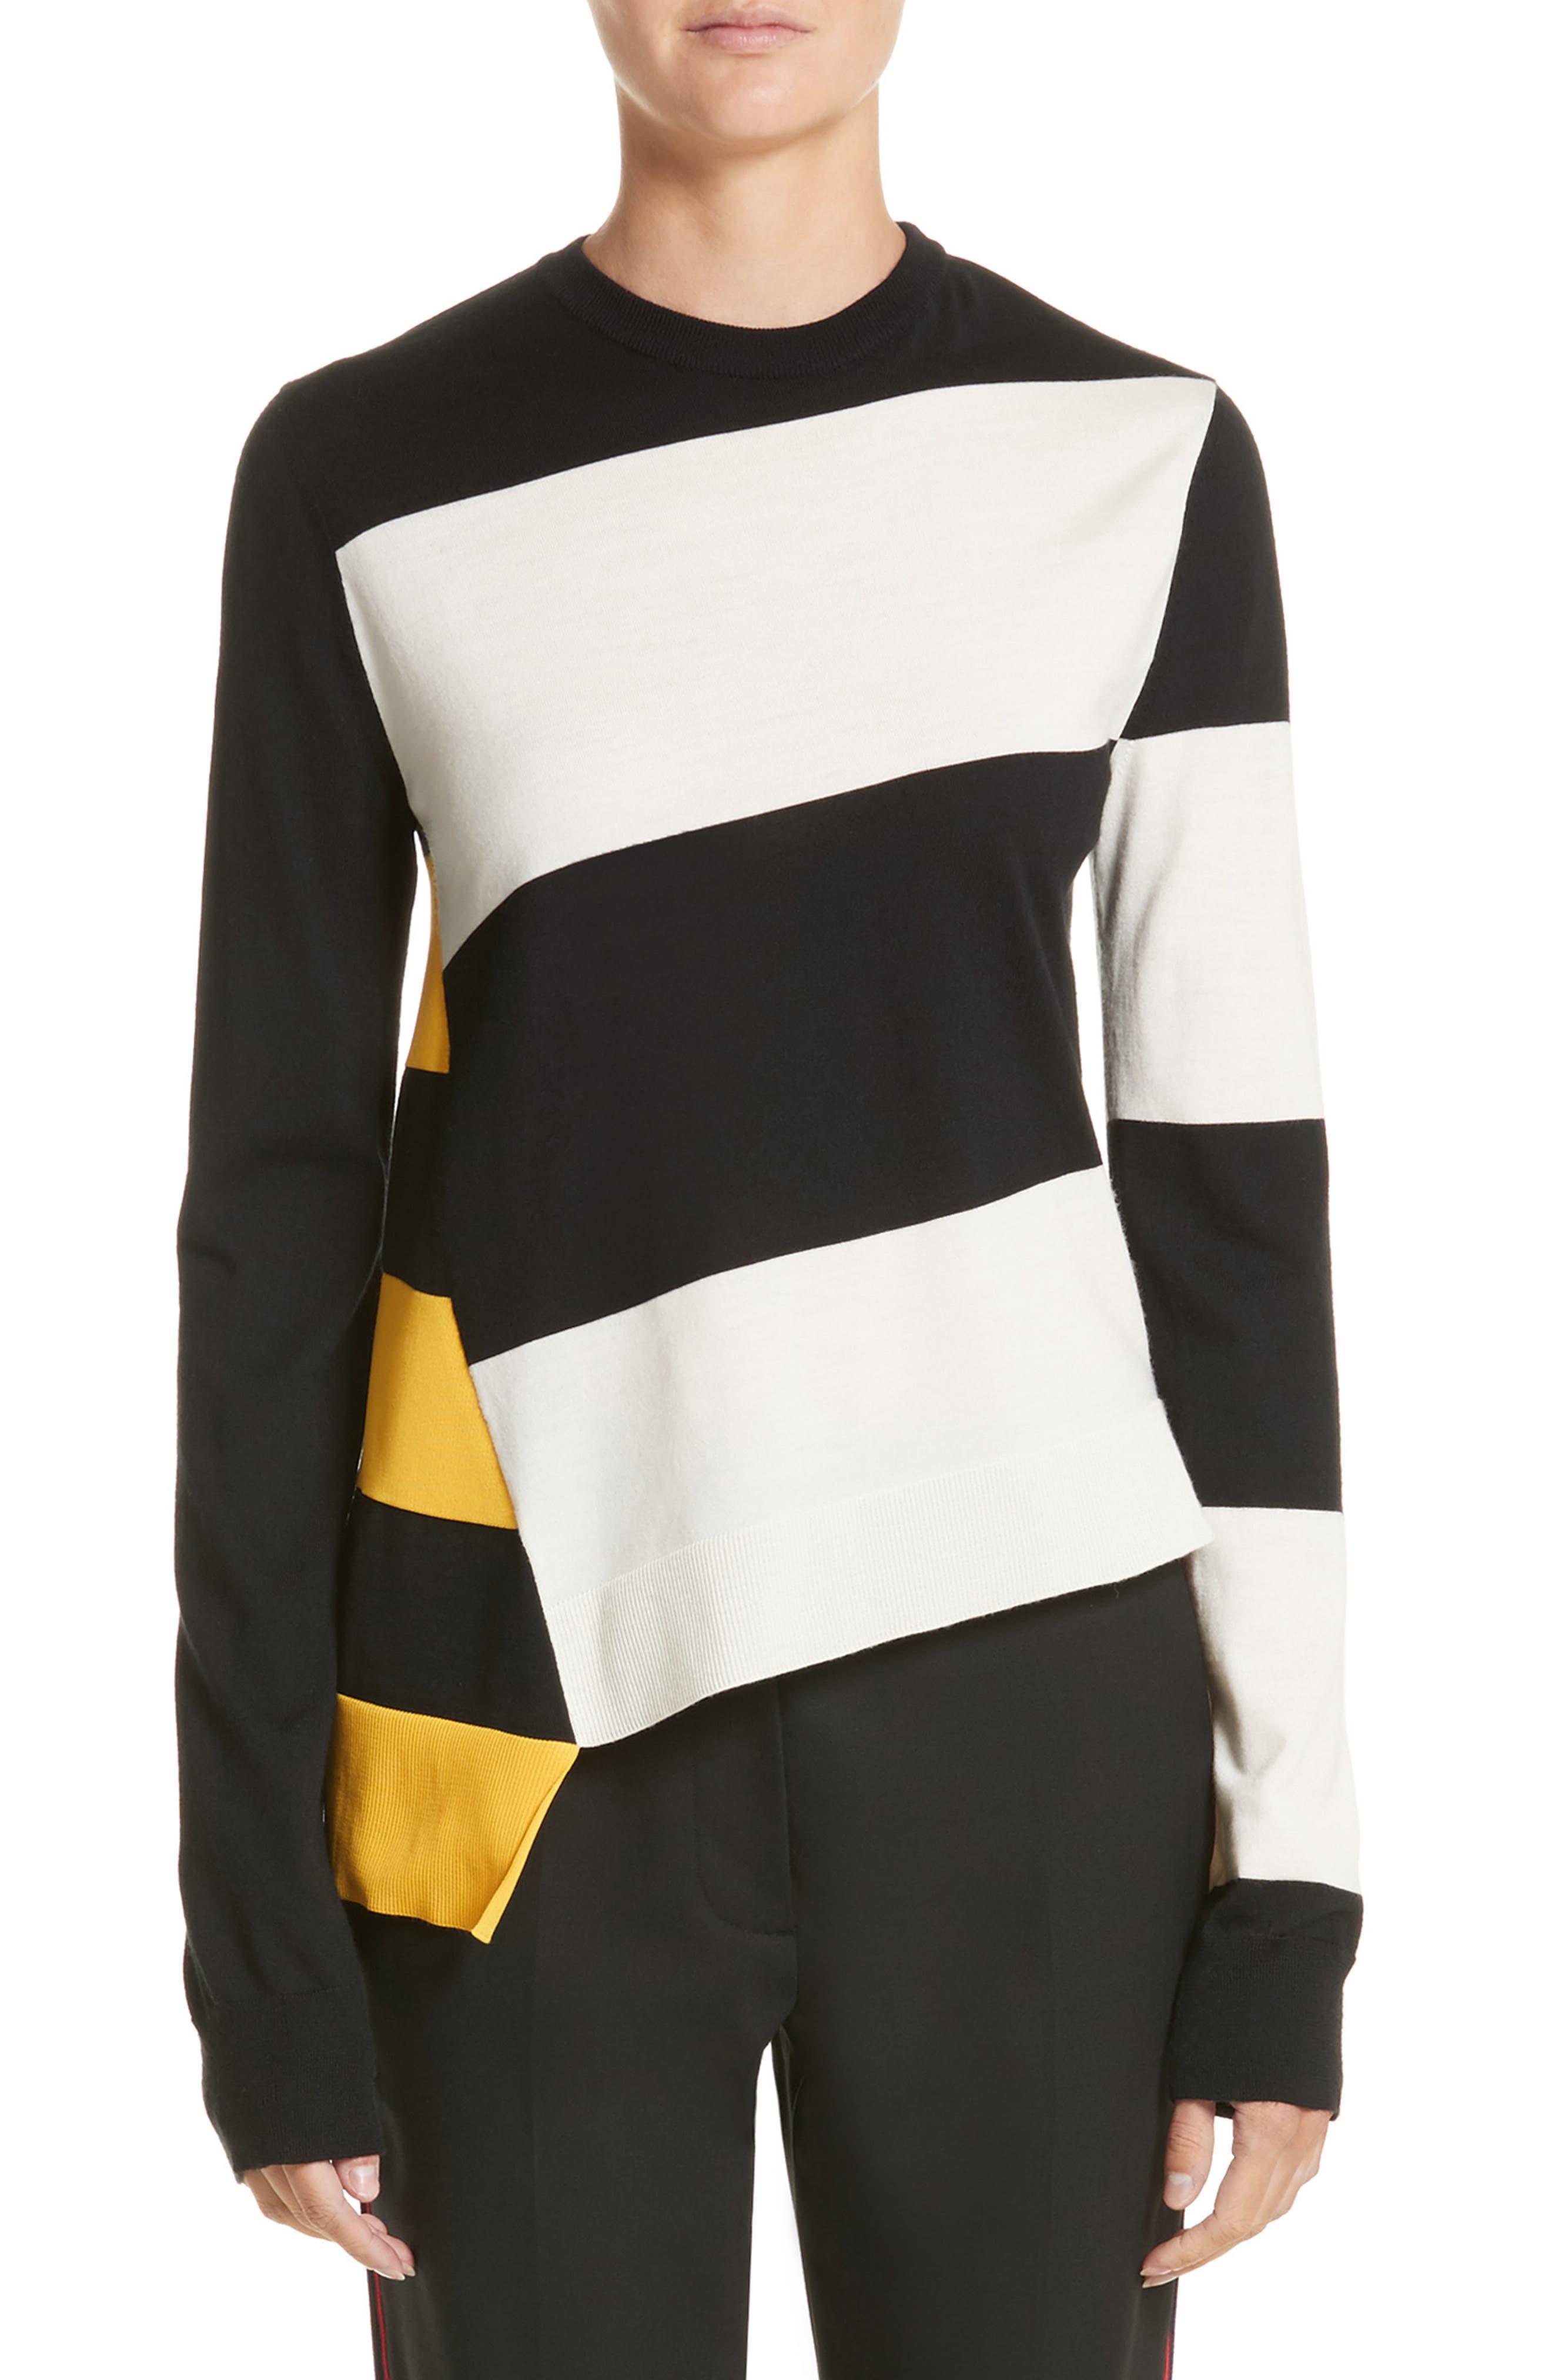 Main Image - Calvin Klein 205W39NYC Bicolor Stripe Merino Wool Blend Sweater